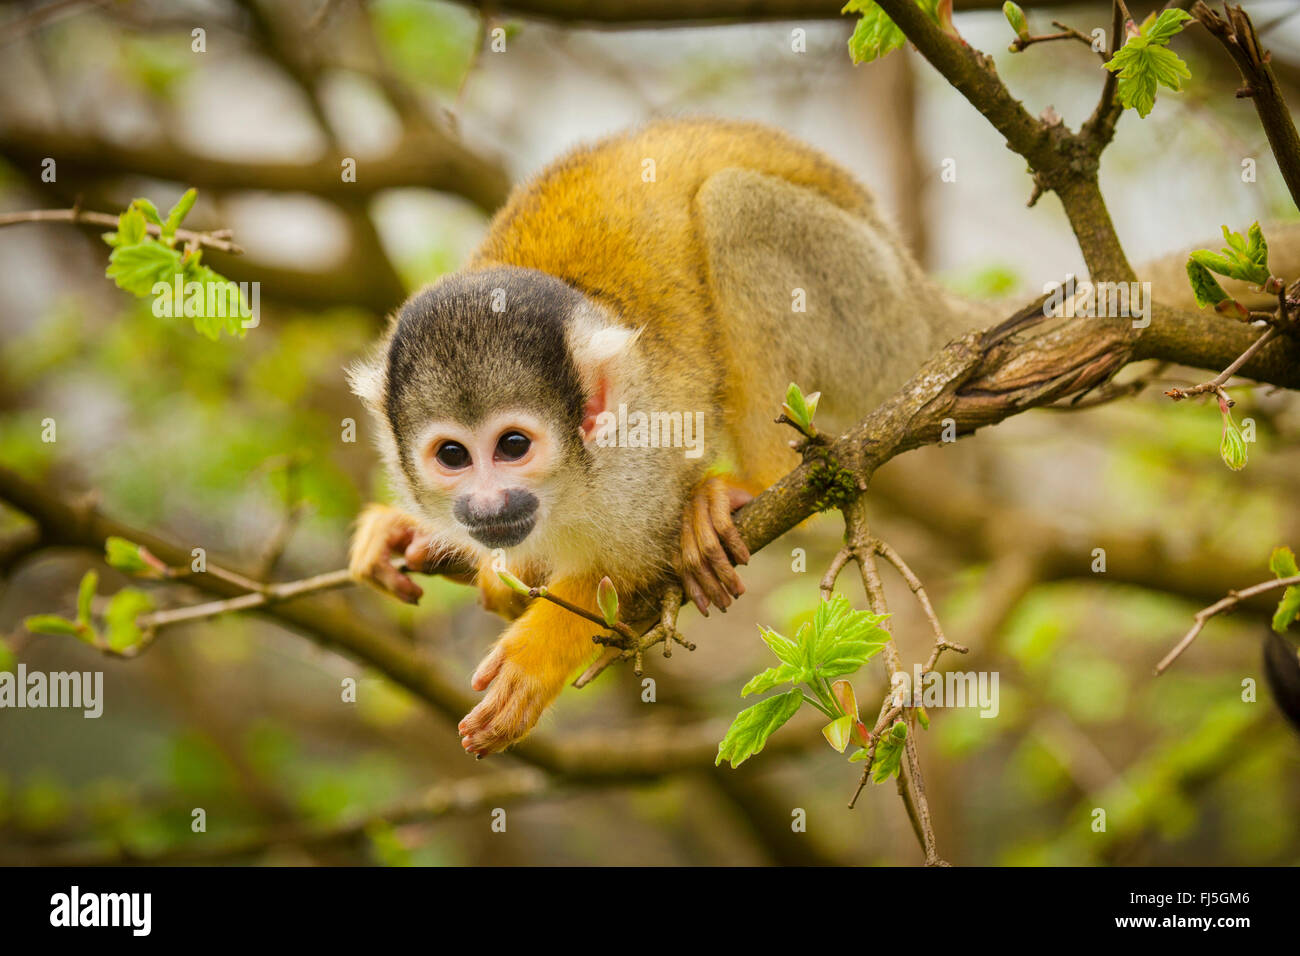 Squirrel monkeys in trees - photo#34